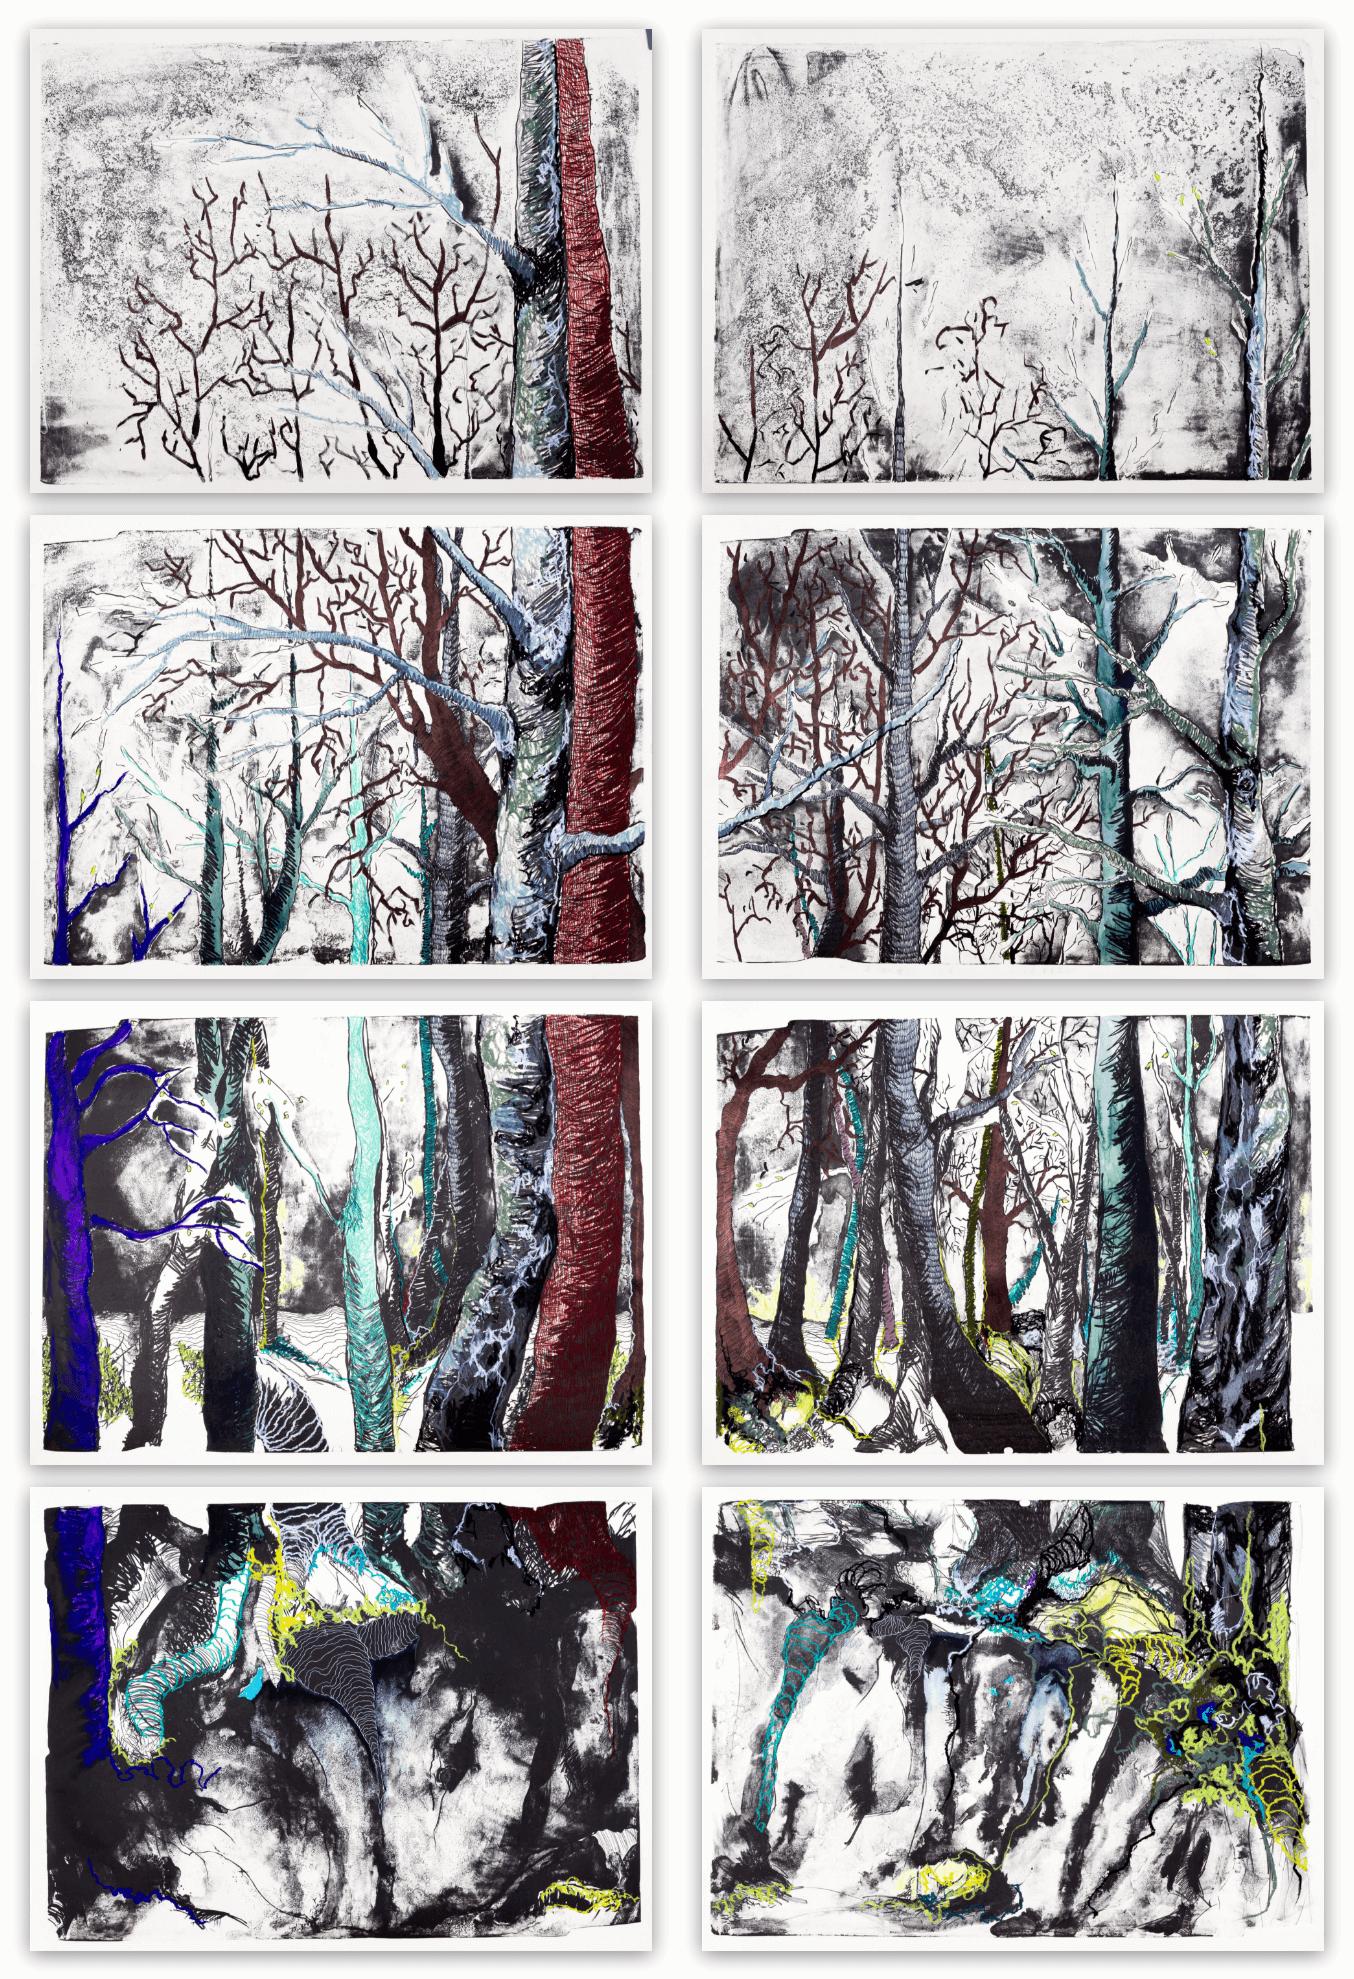 Katharina Albers, WALD-(FB), 2016, Lithographie handkoloriert (Ölkreide, Graphit, Aquarellfarbe, Fineliner) Unikat (8 Steine je 70×100 cm)